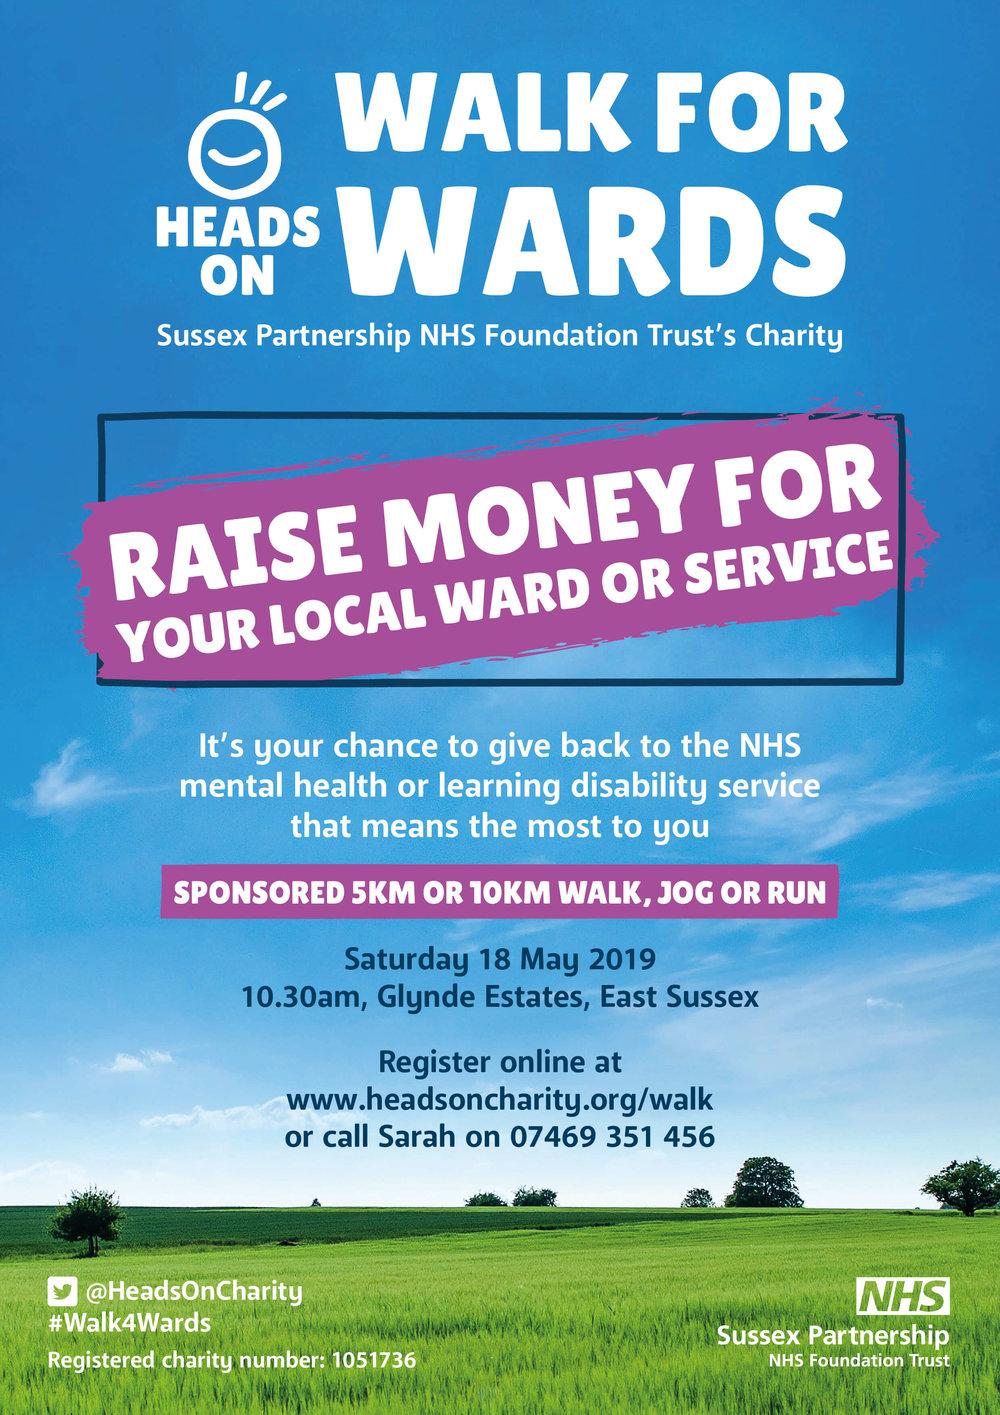 Walk For Wards 2019 Poster.jpg